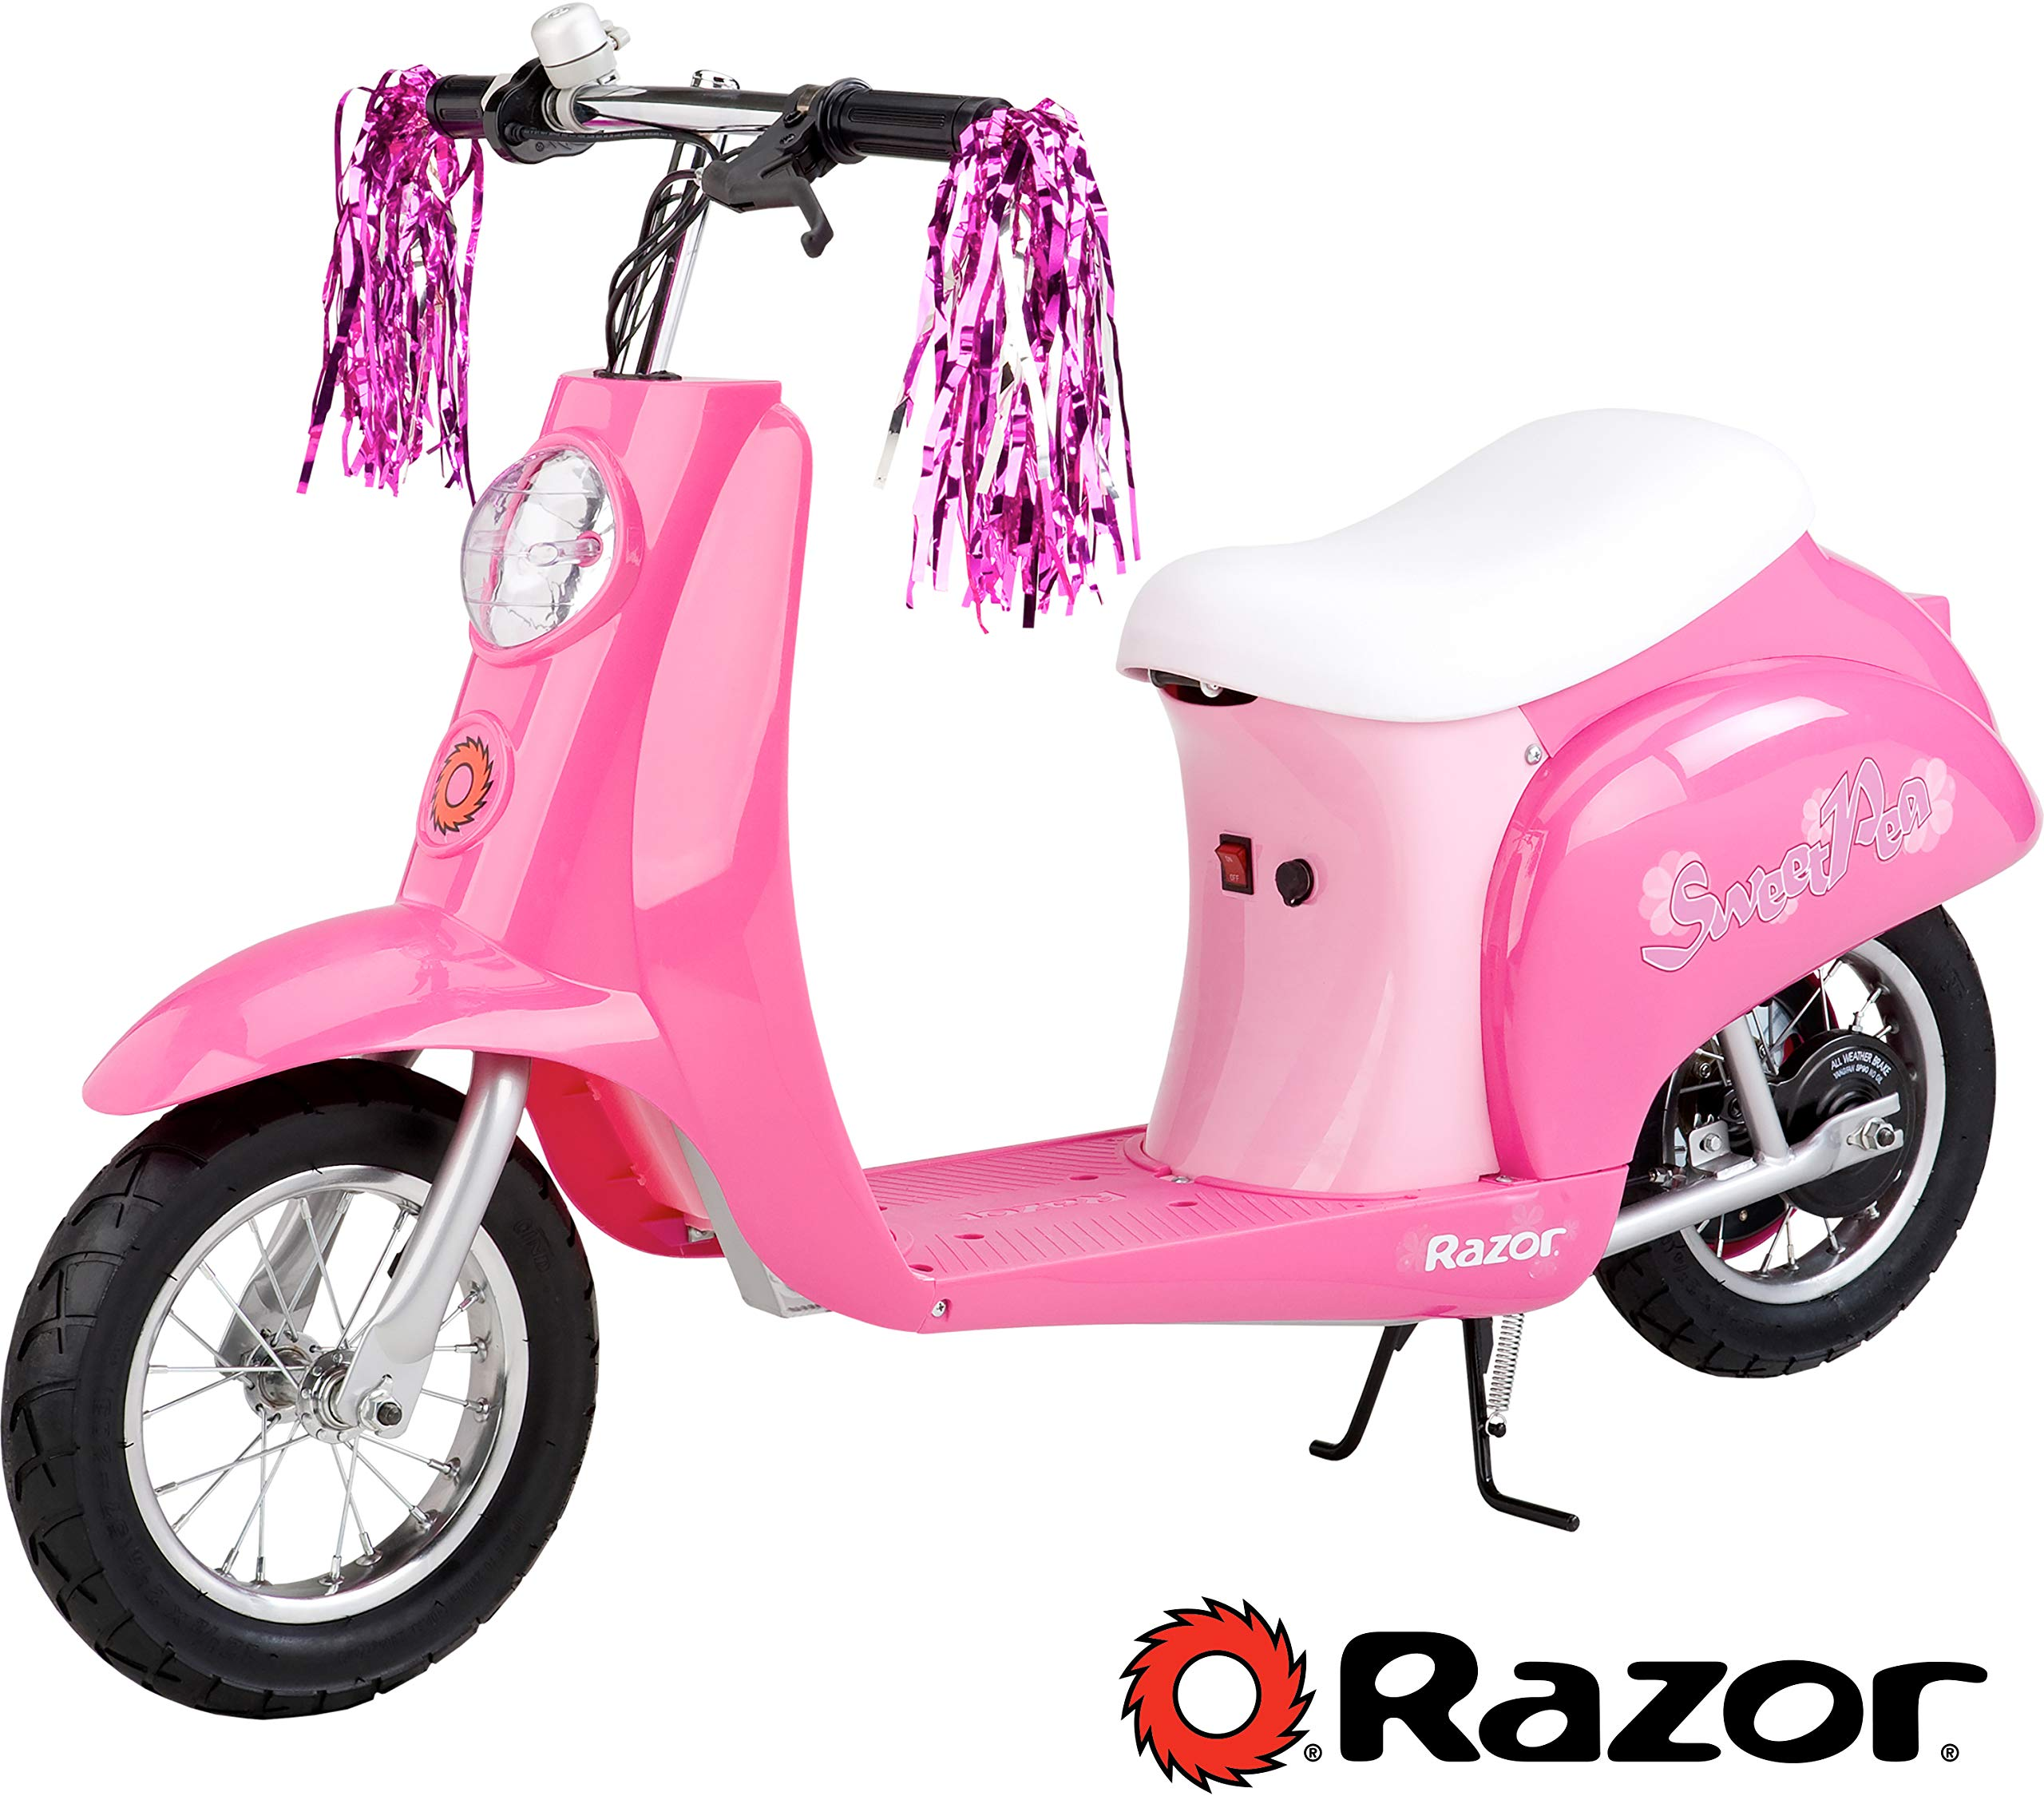 Razor Pocket Mod Miniature Euro Electric Scooter - Sweet Pea by Razor